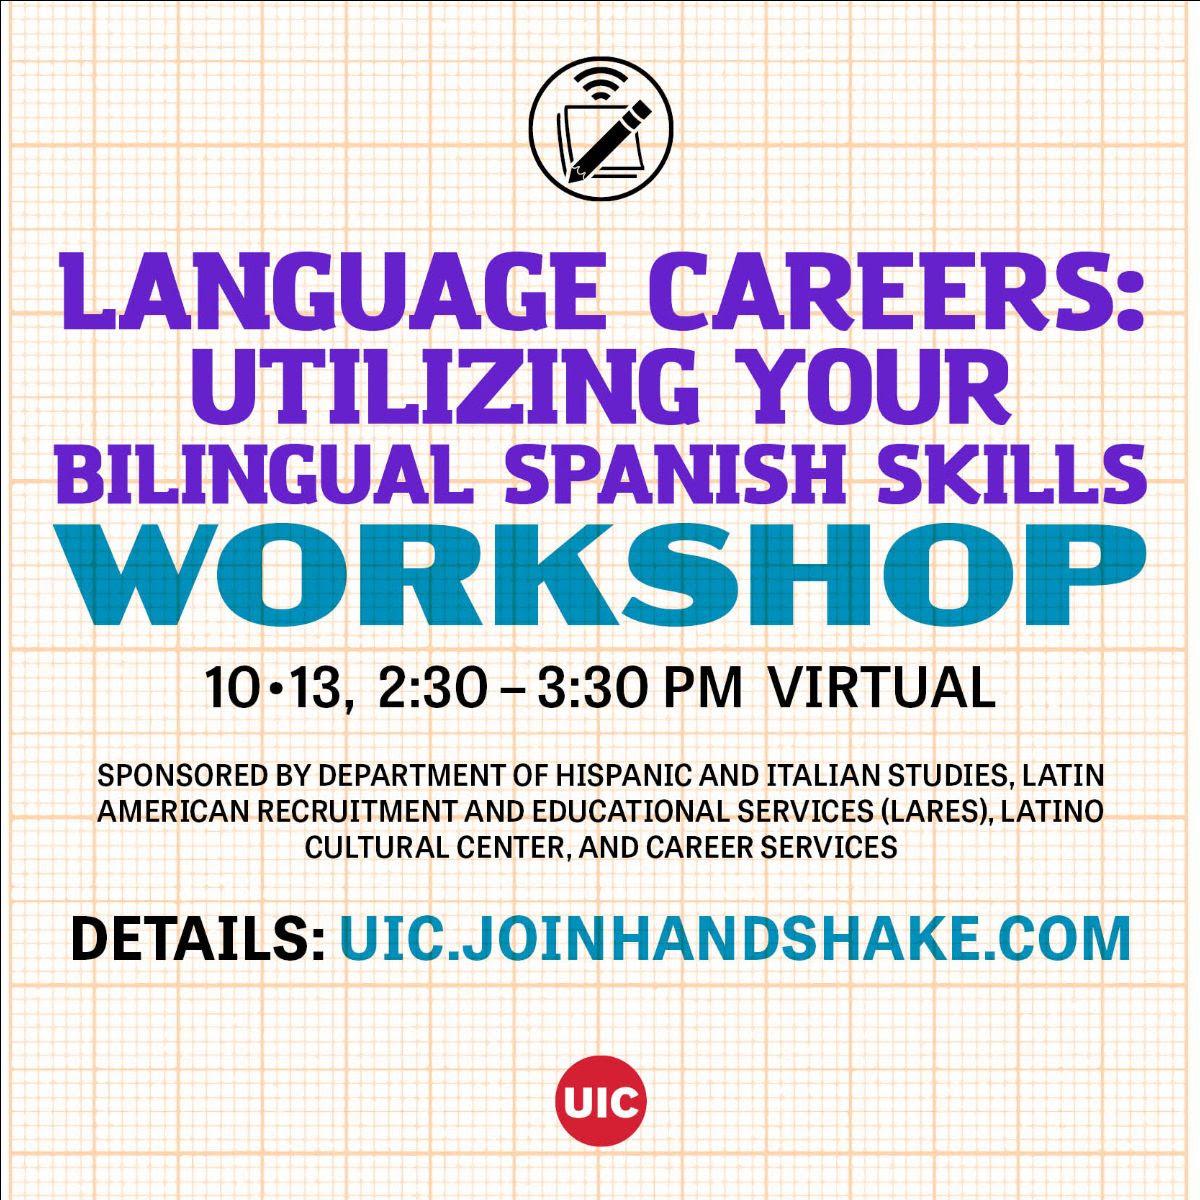 Flyer for Language Careers: Utilizing Your Bilingual Spanish Skills Workshop 10.13.2021